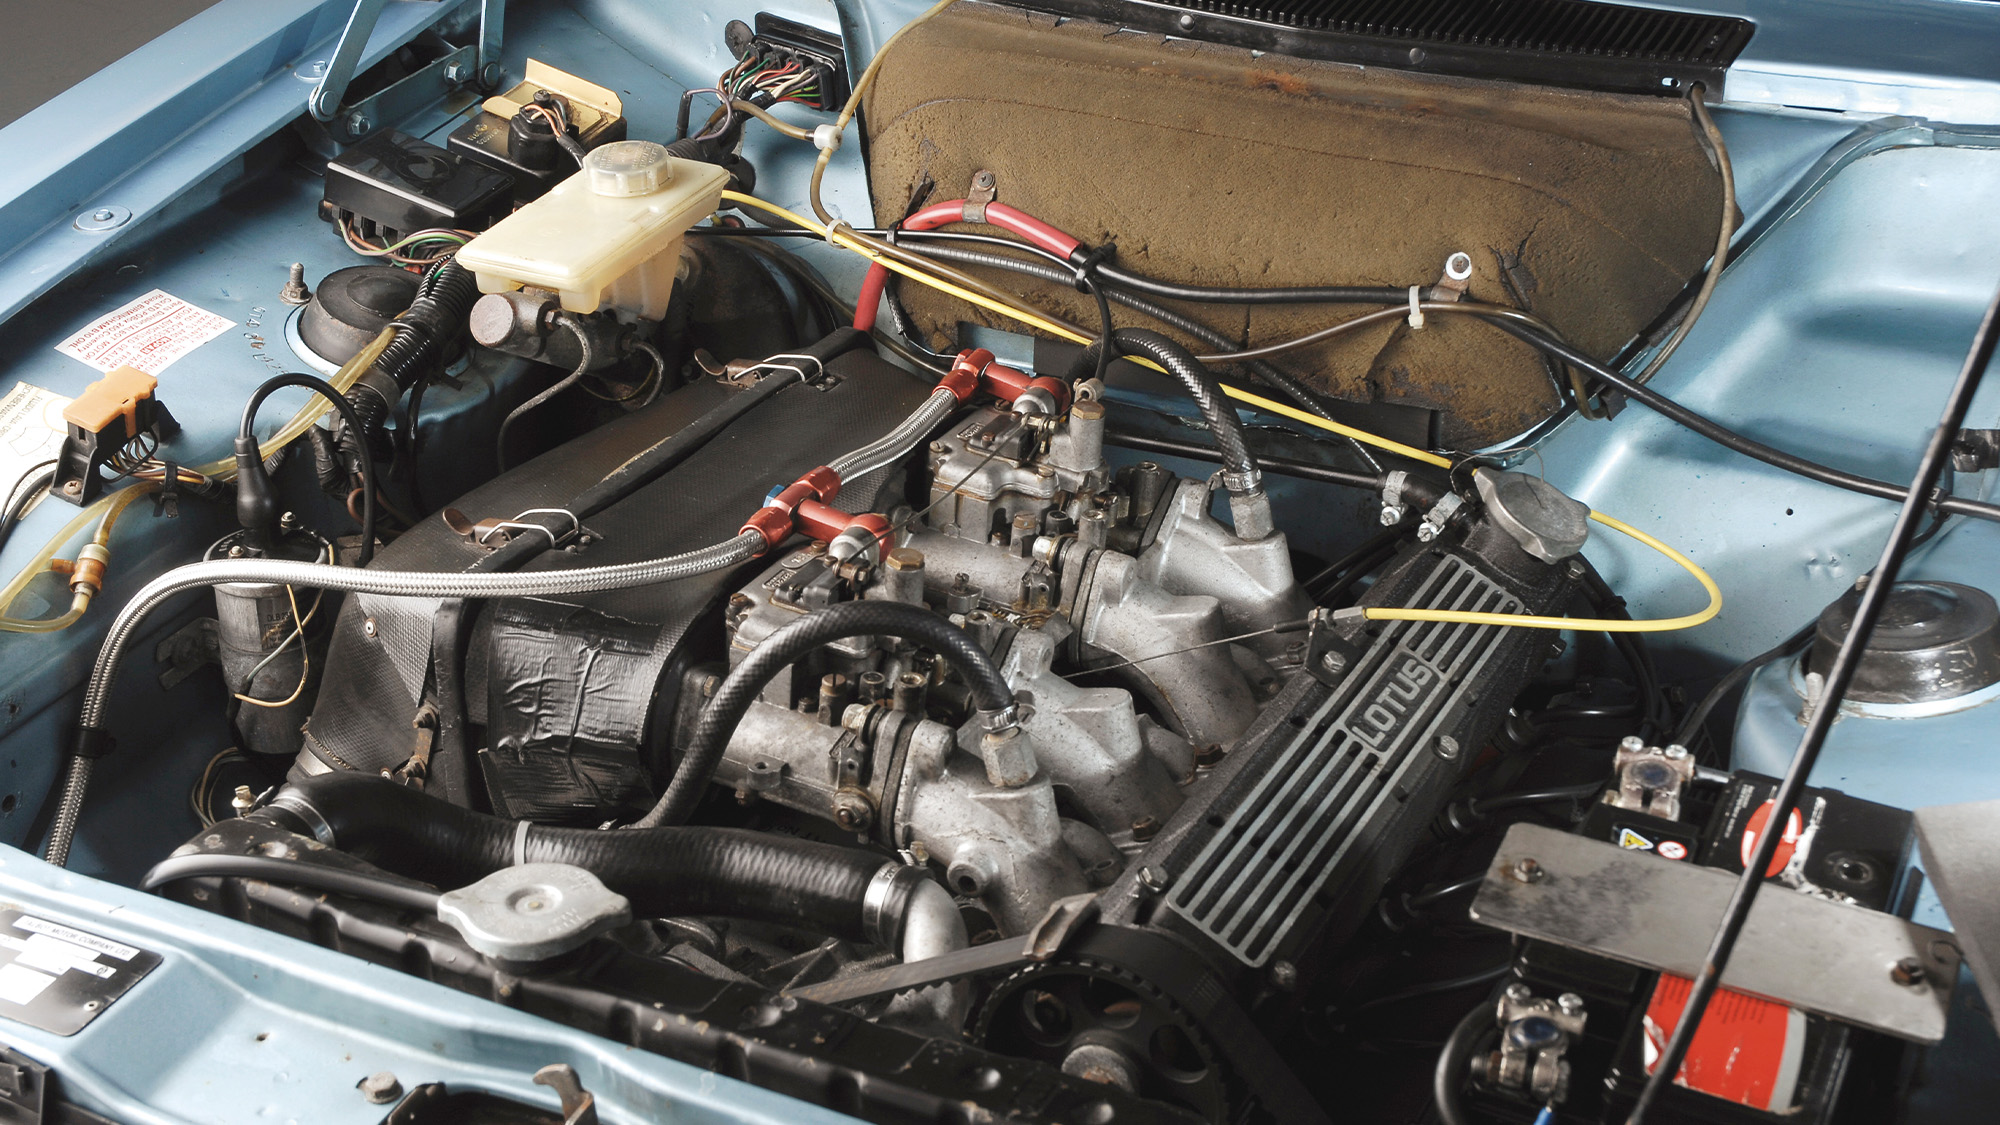 2.2 litre Lotus engine in the Talbot Sunbeam Lotus